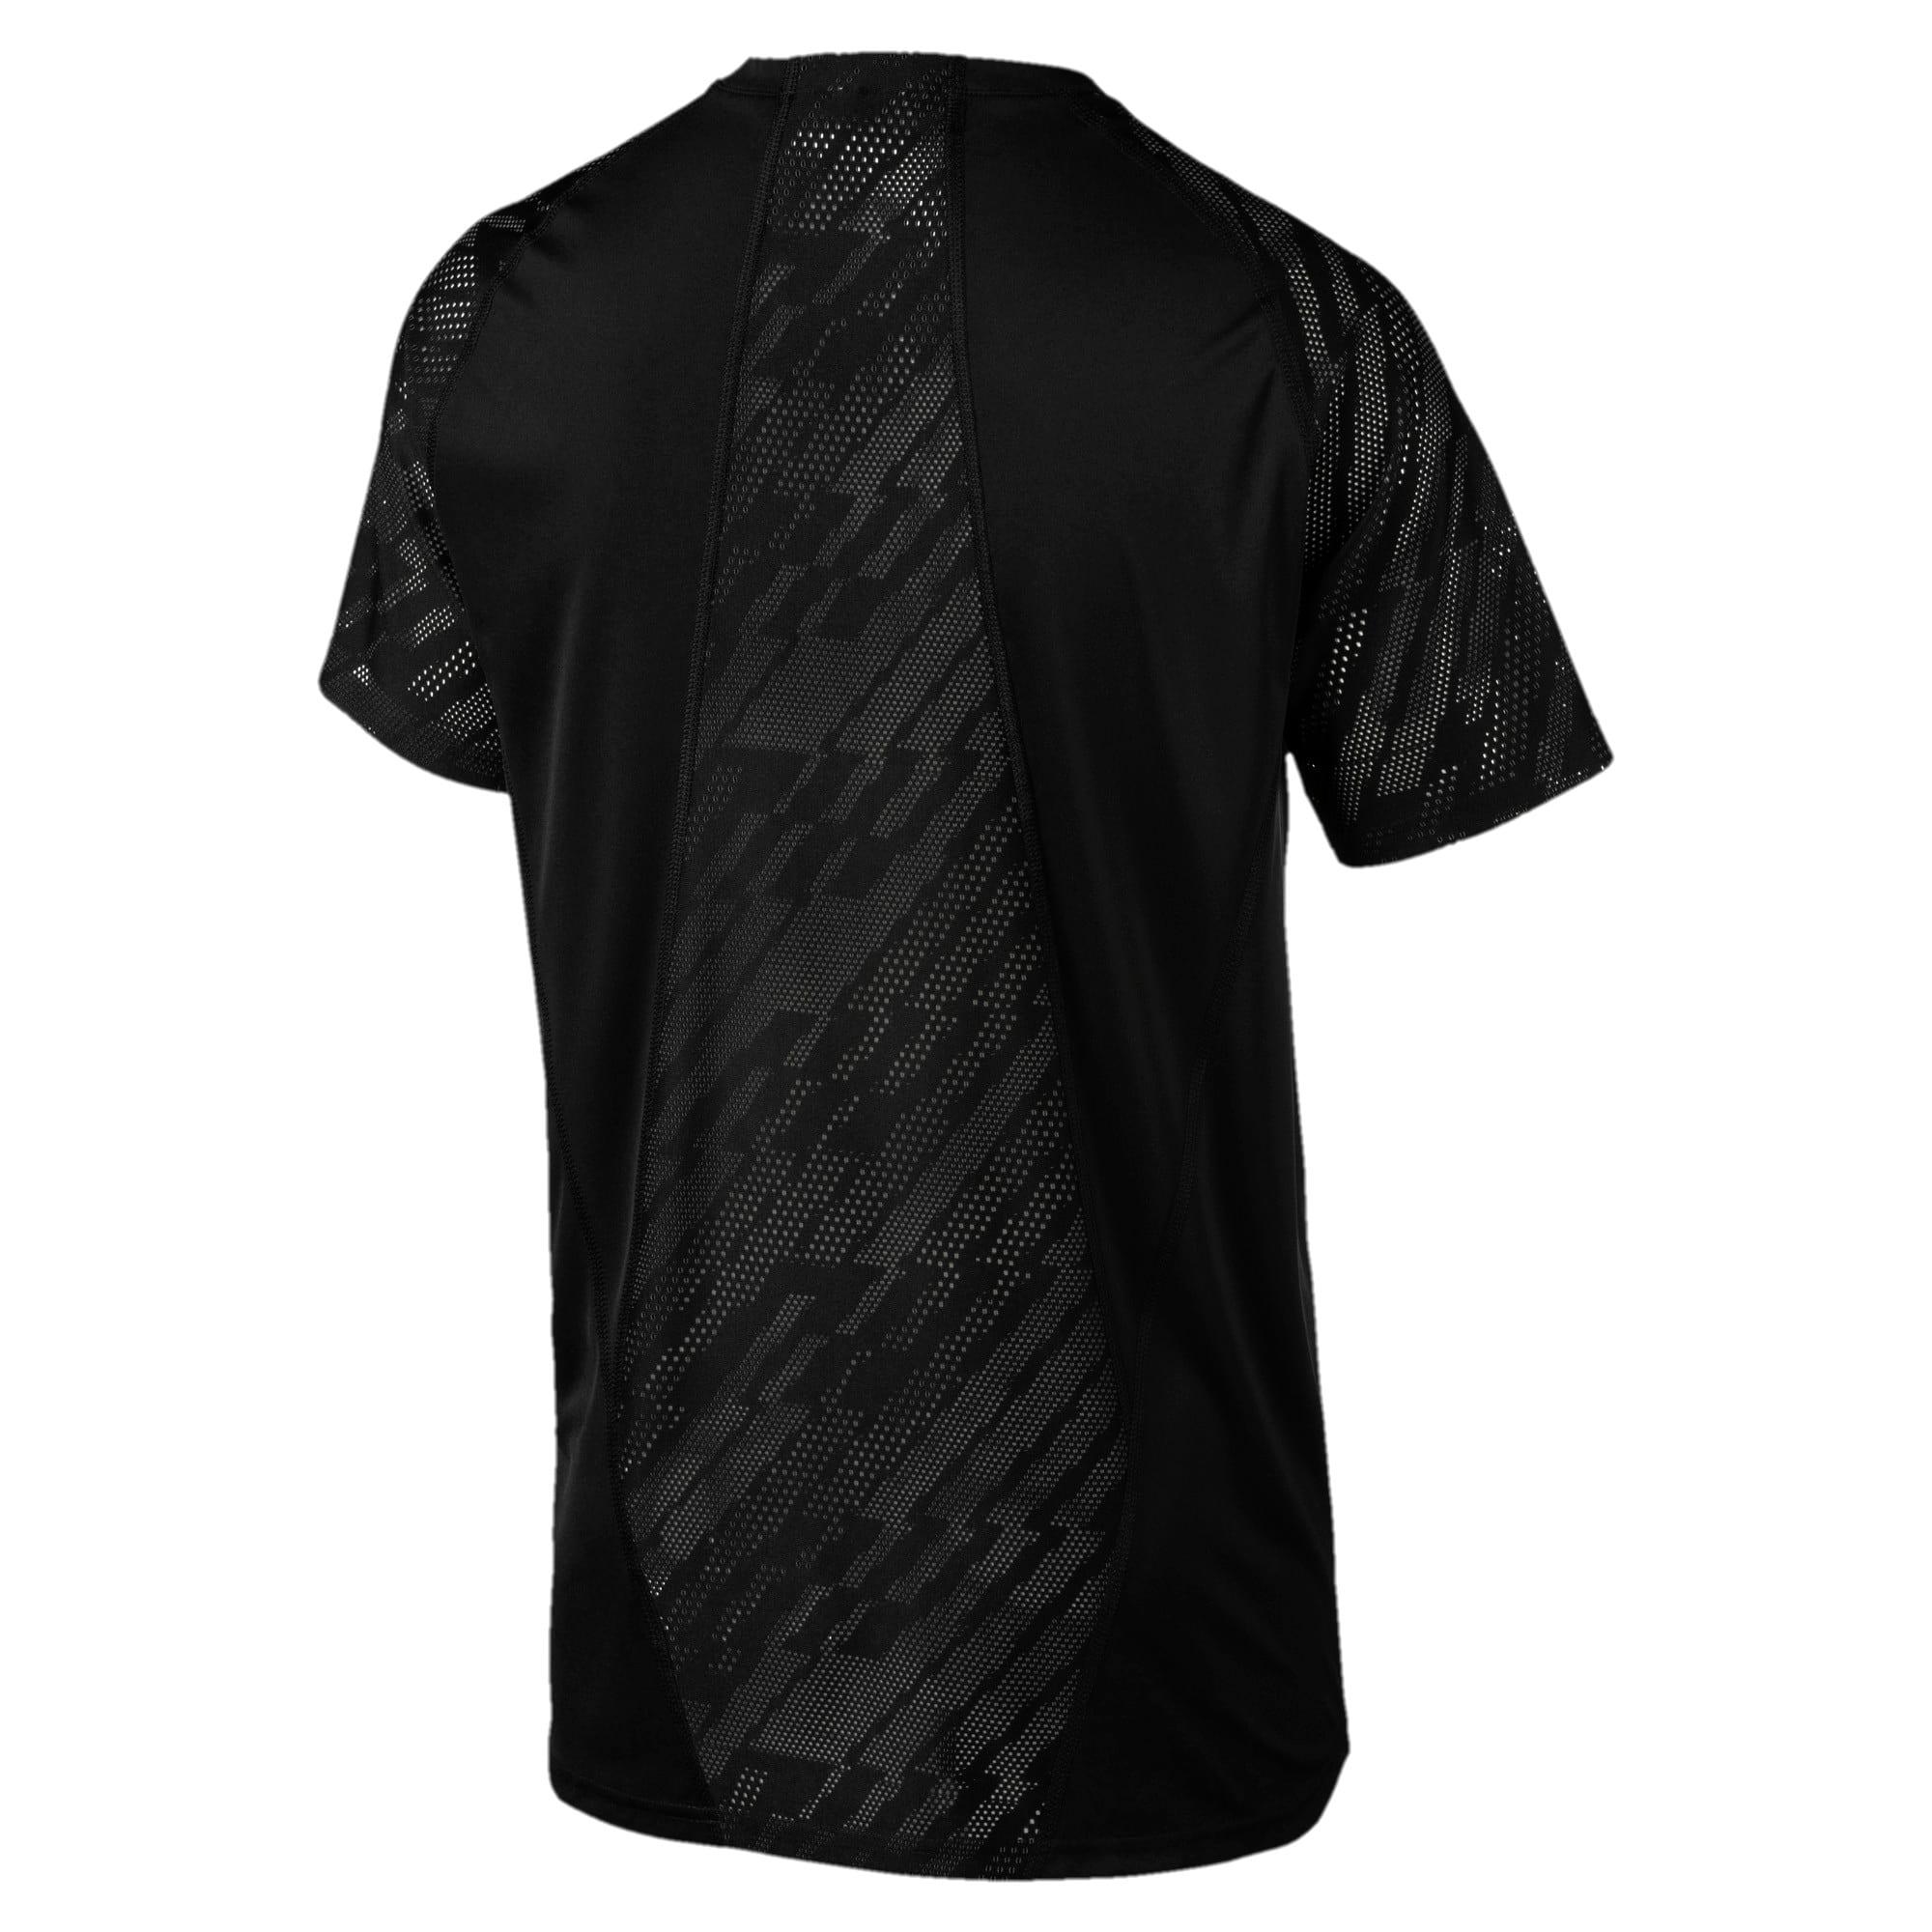 Thumbnail 4 of VENT Graphic Men's T-Shirt, Puma Black-iron gate, medium-IND